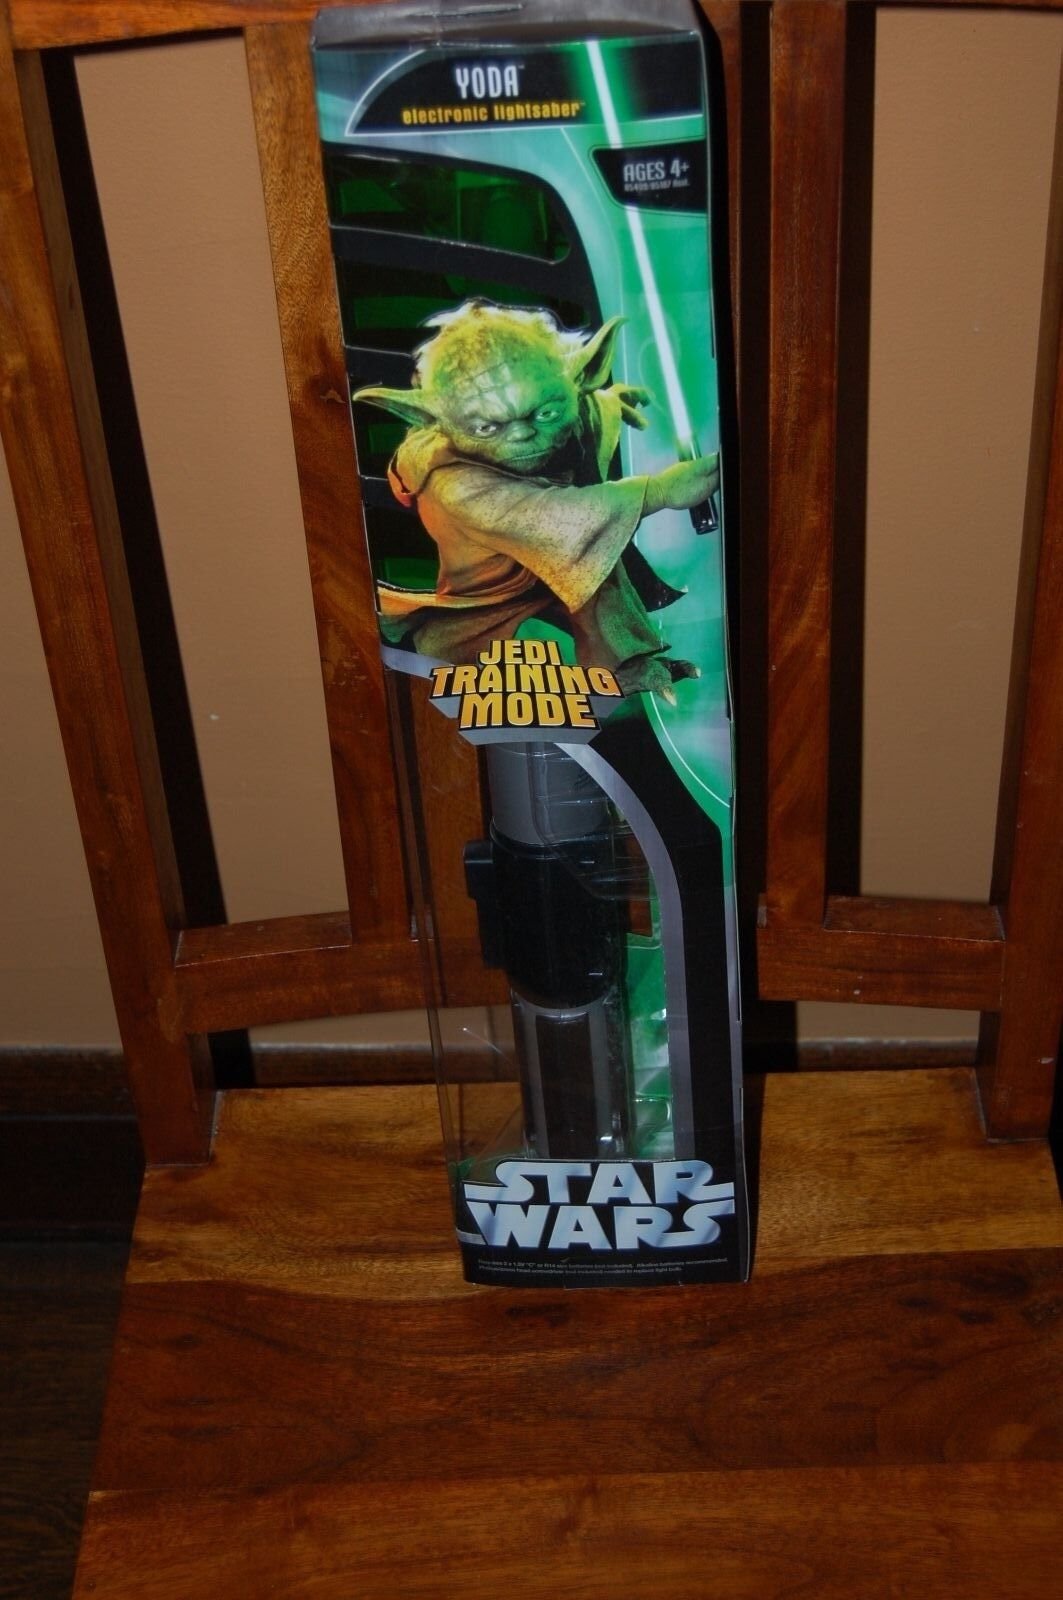 Yoda Jedi Training modelo, lucha Electronic Estrella Wars bebé 2005